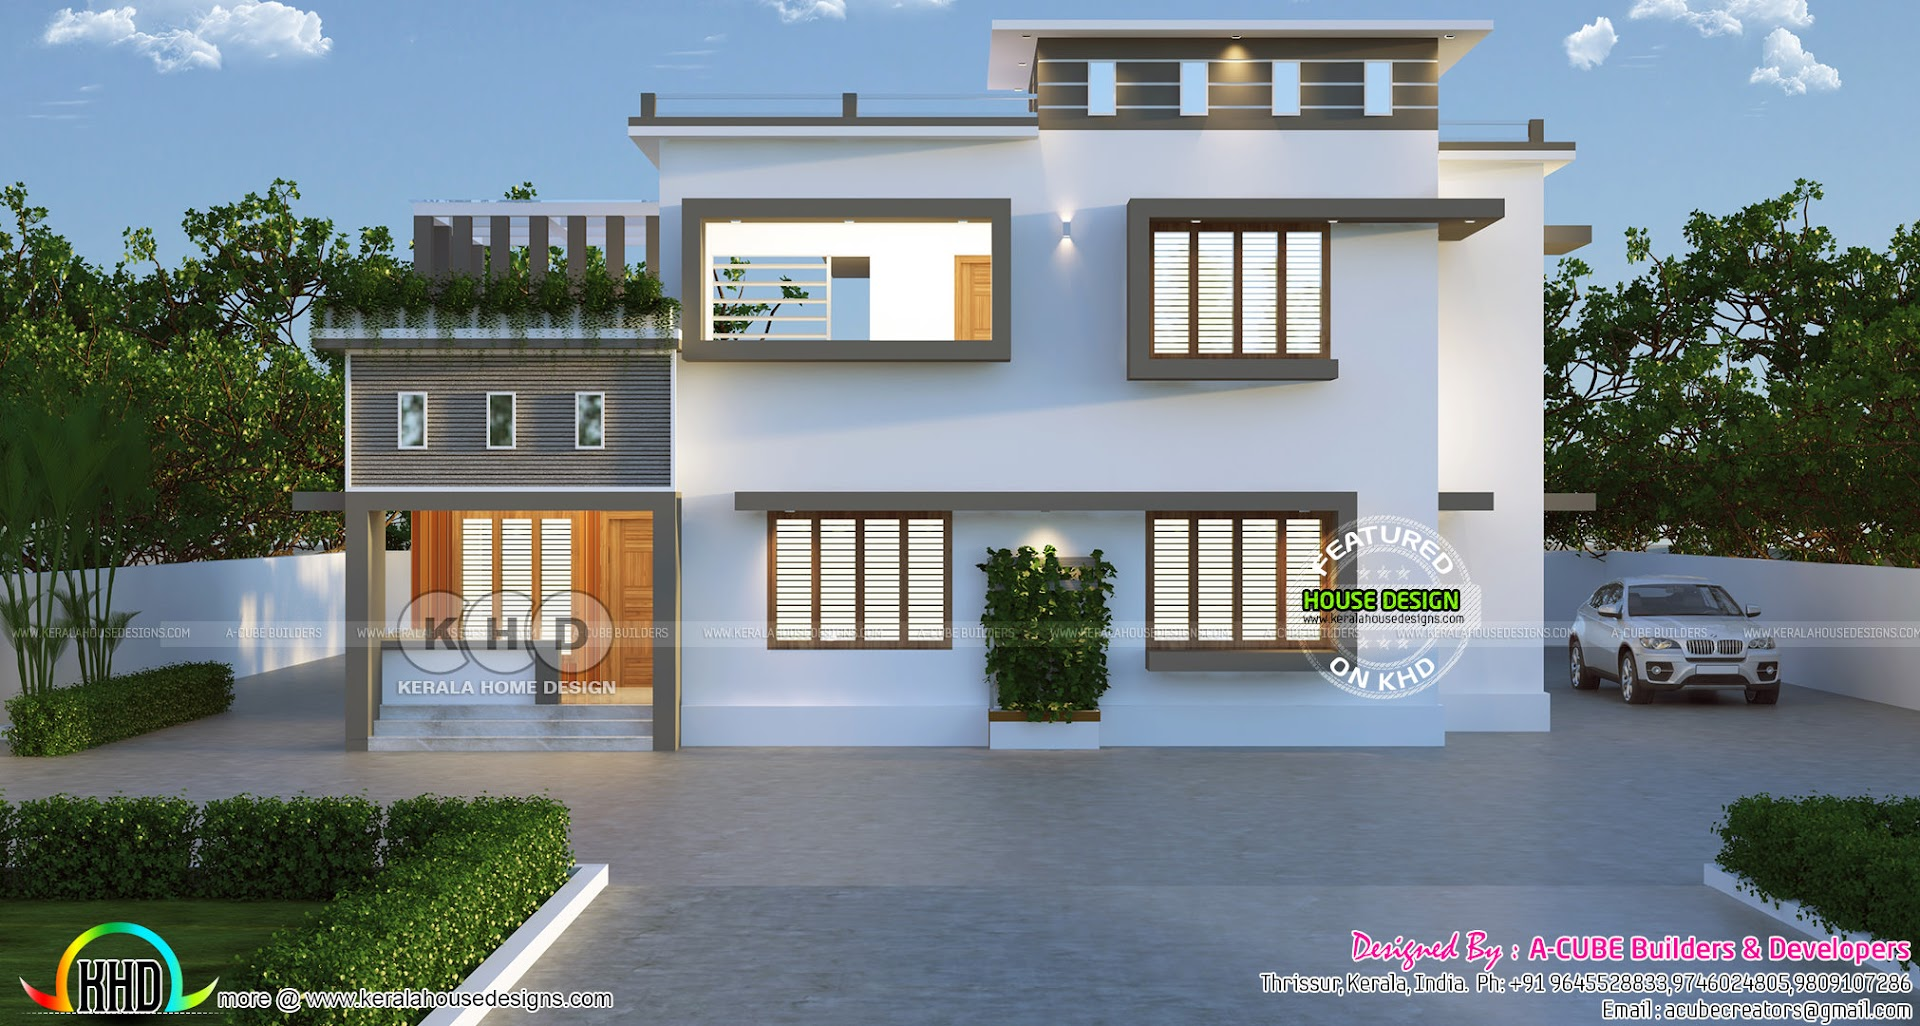 Simple Modern Flat Roof 2223 Sq Ft 4 Bhk House Kerala Home